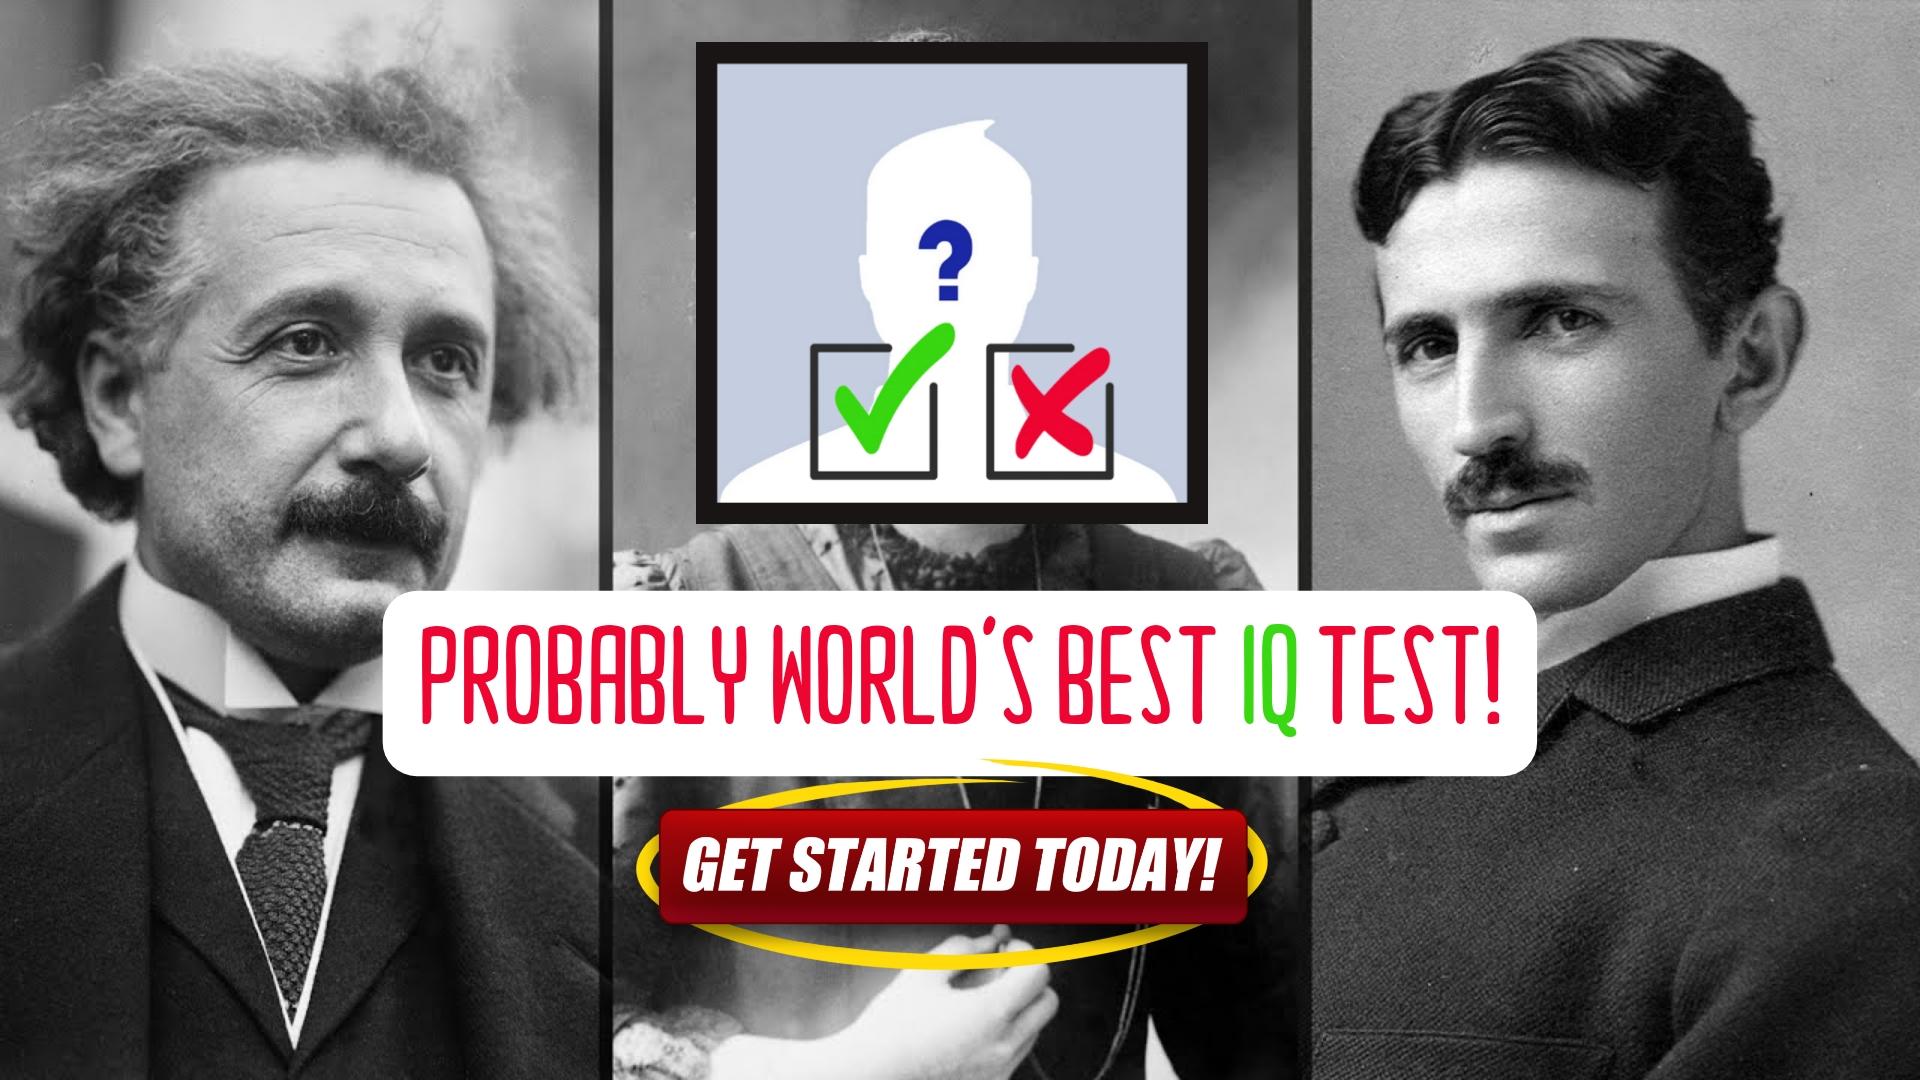 Probably World's Best IQ Test!